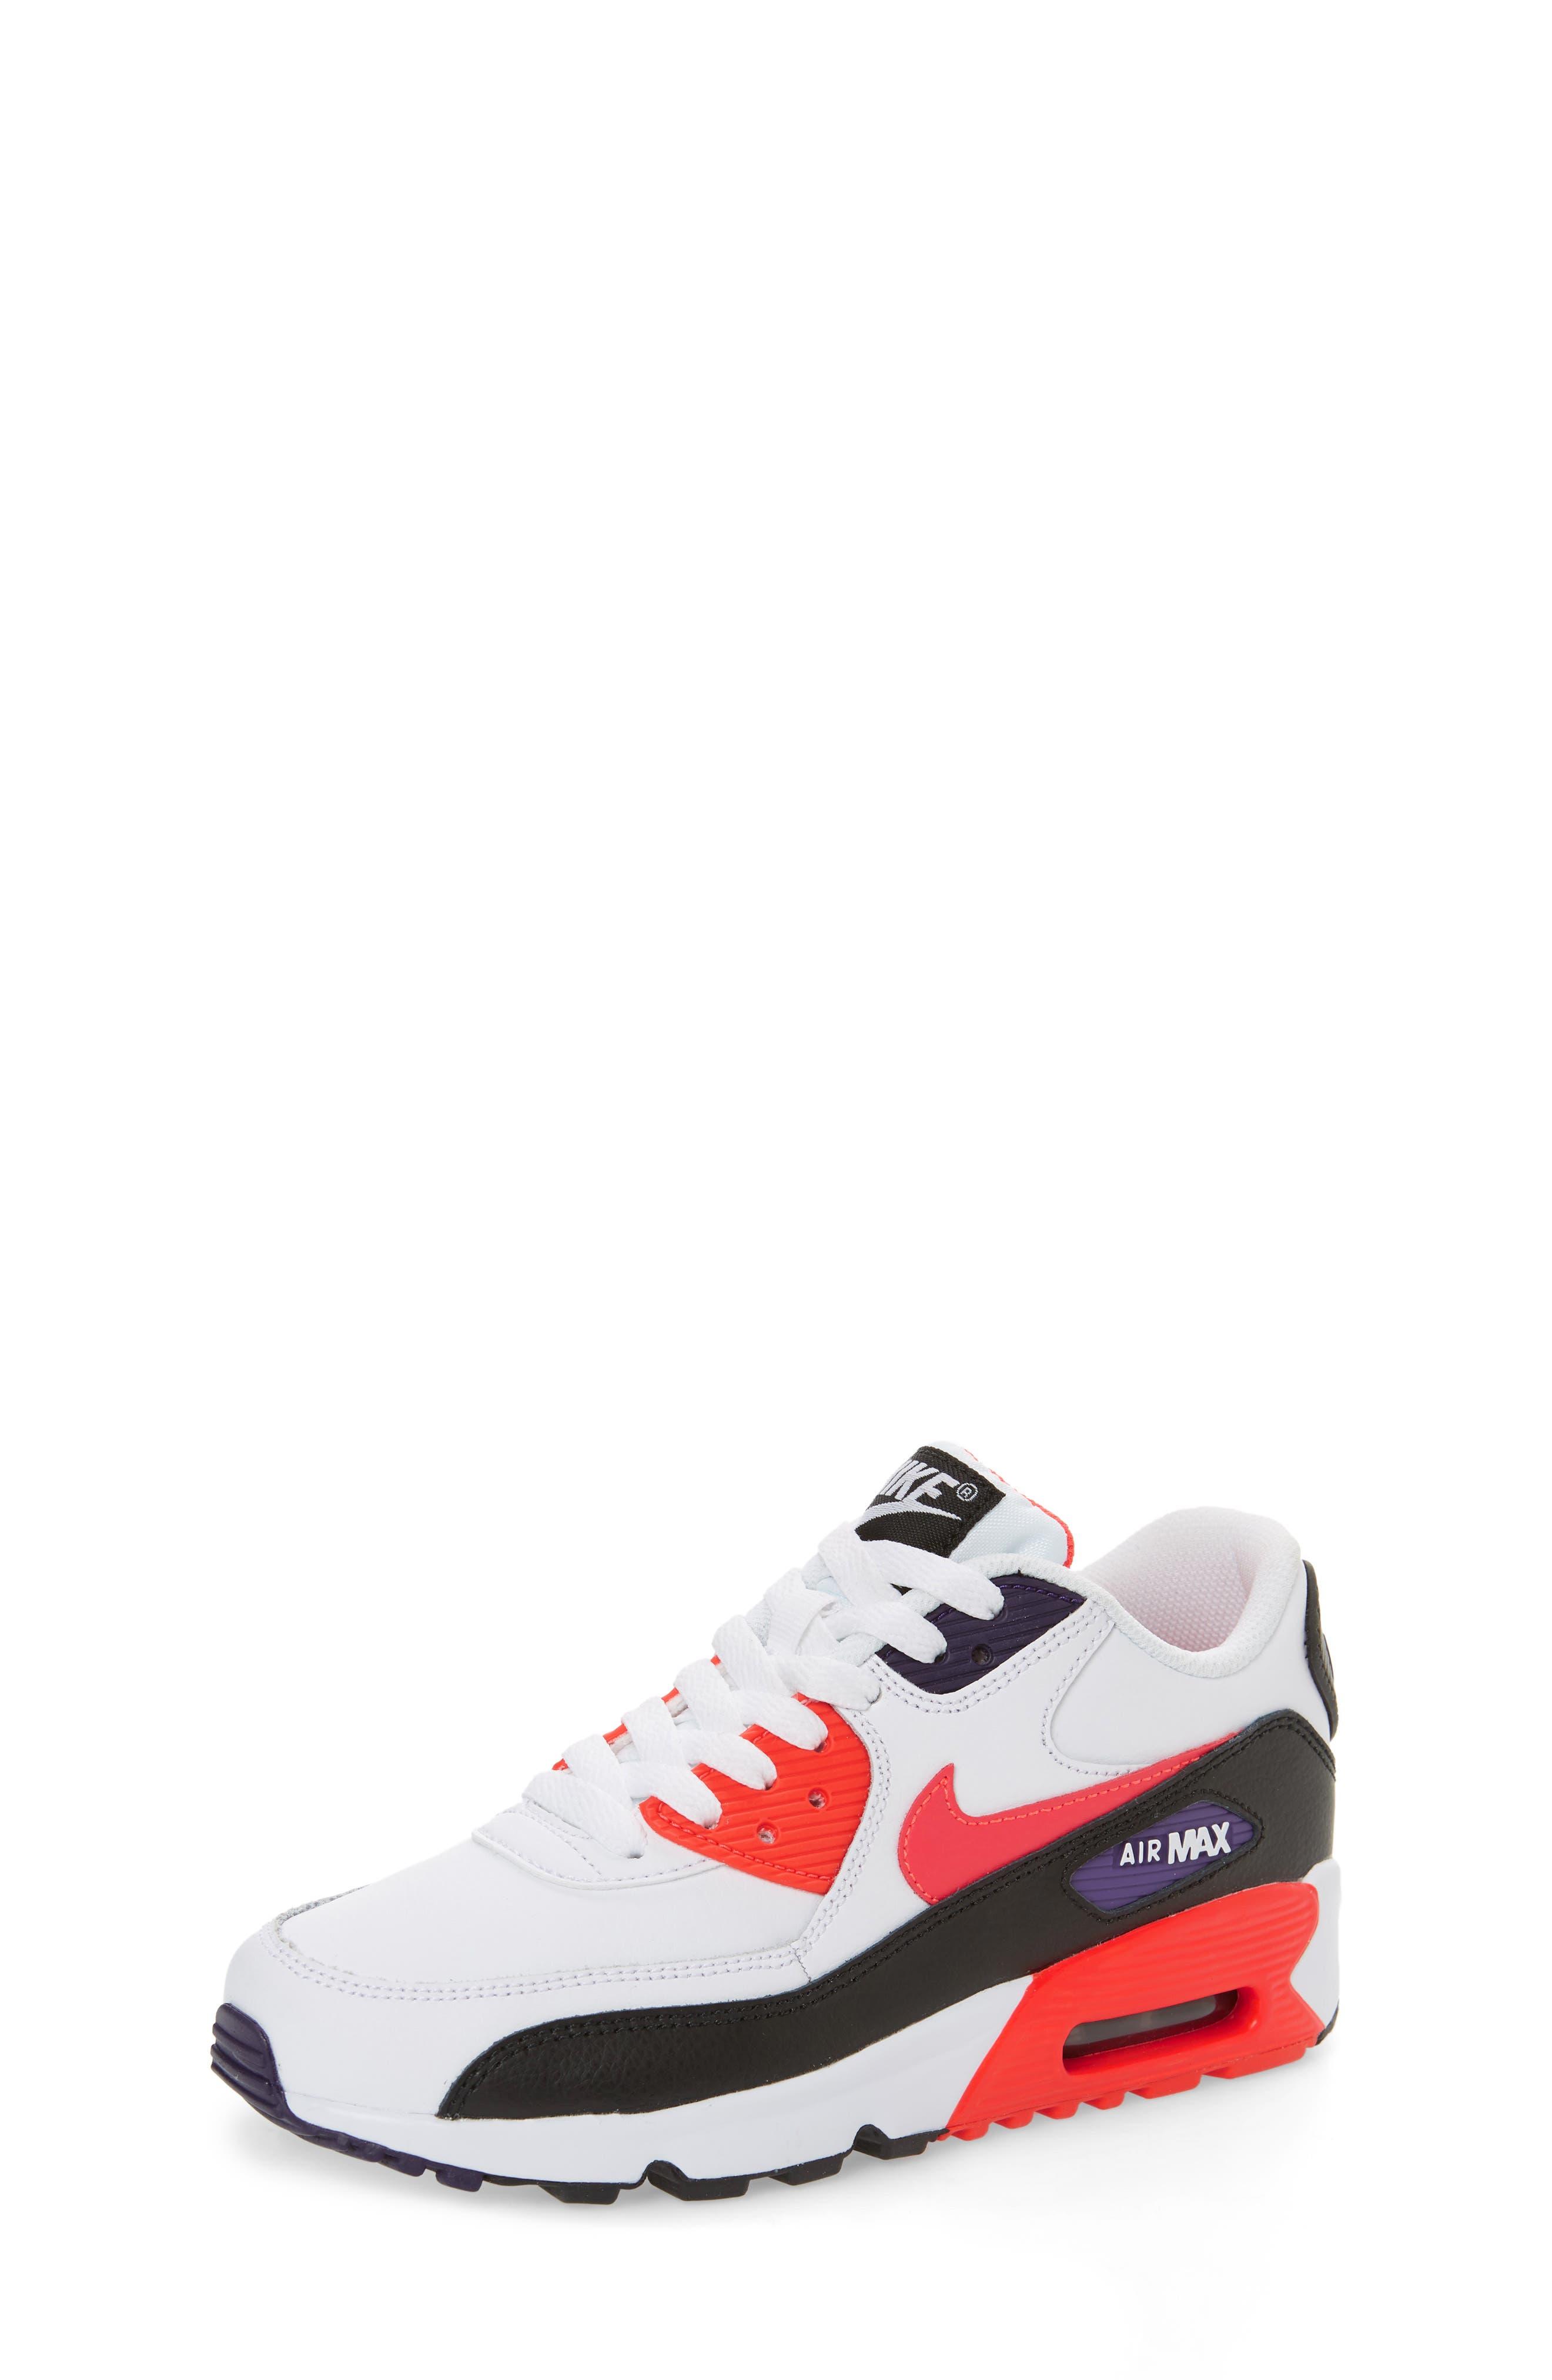 26d6bcf095a2f Nike | Nordstrom